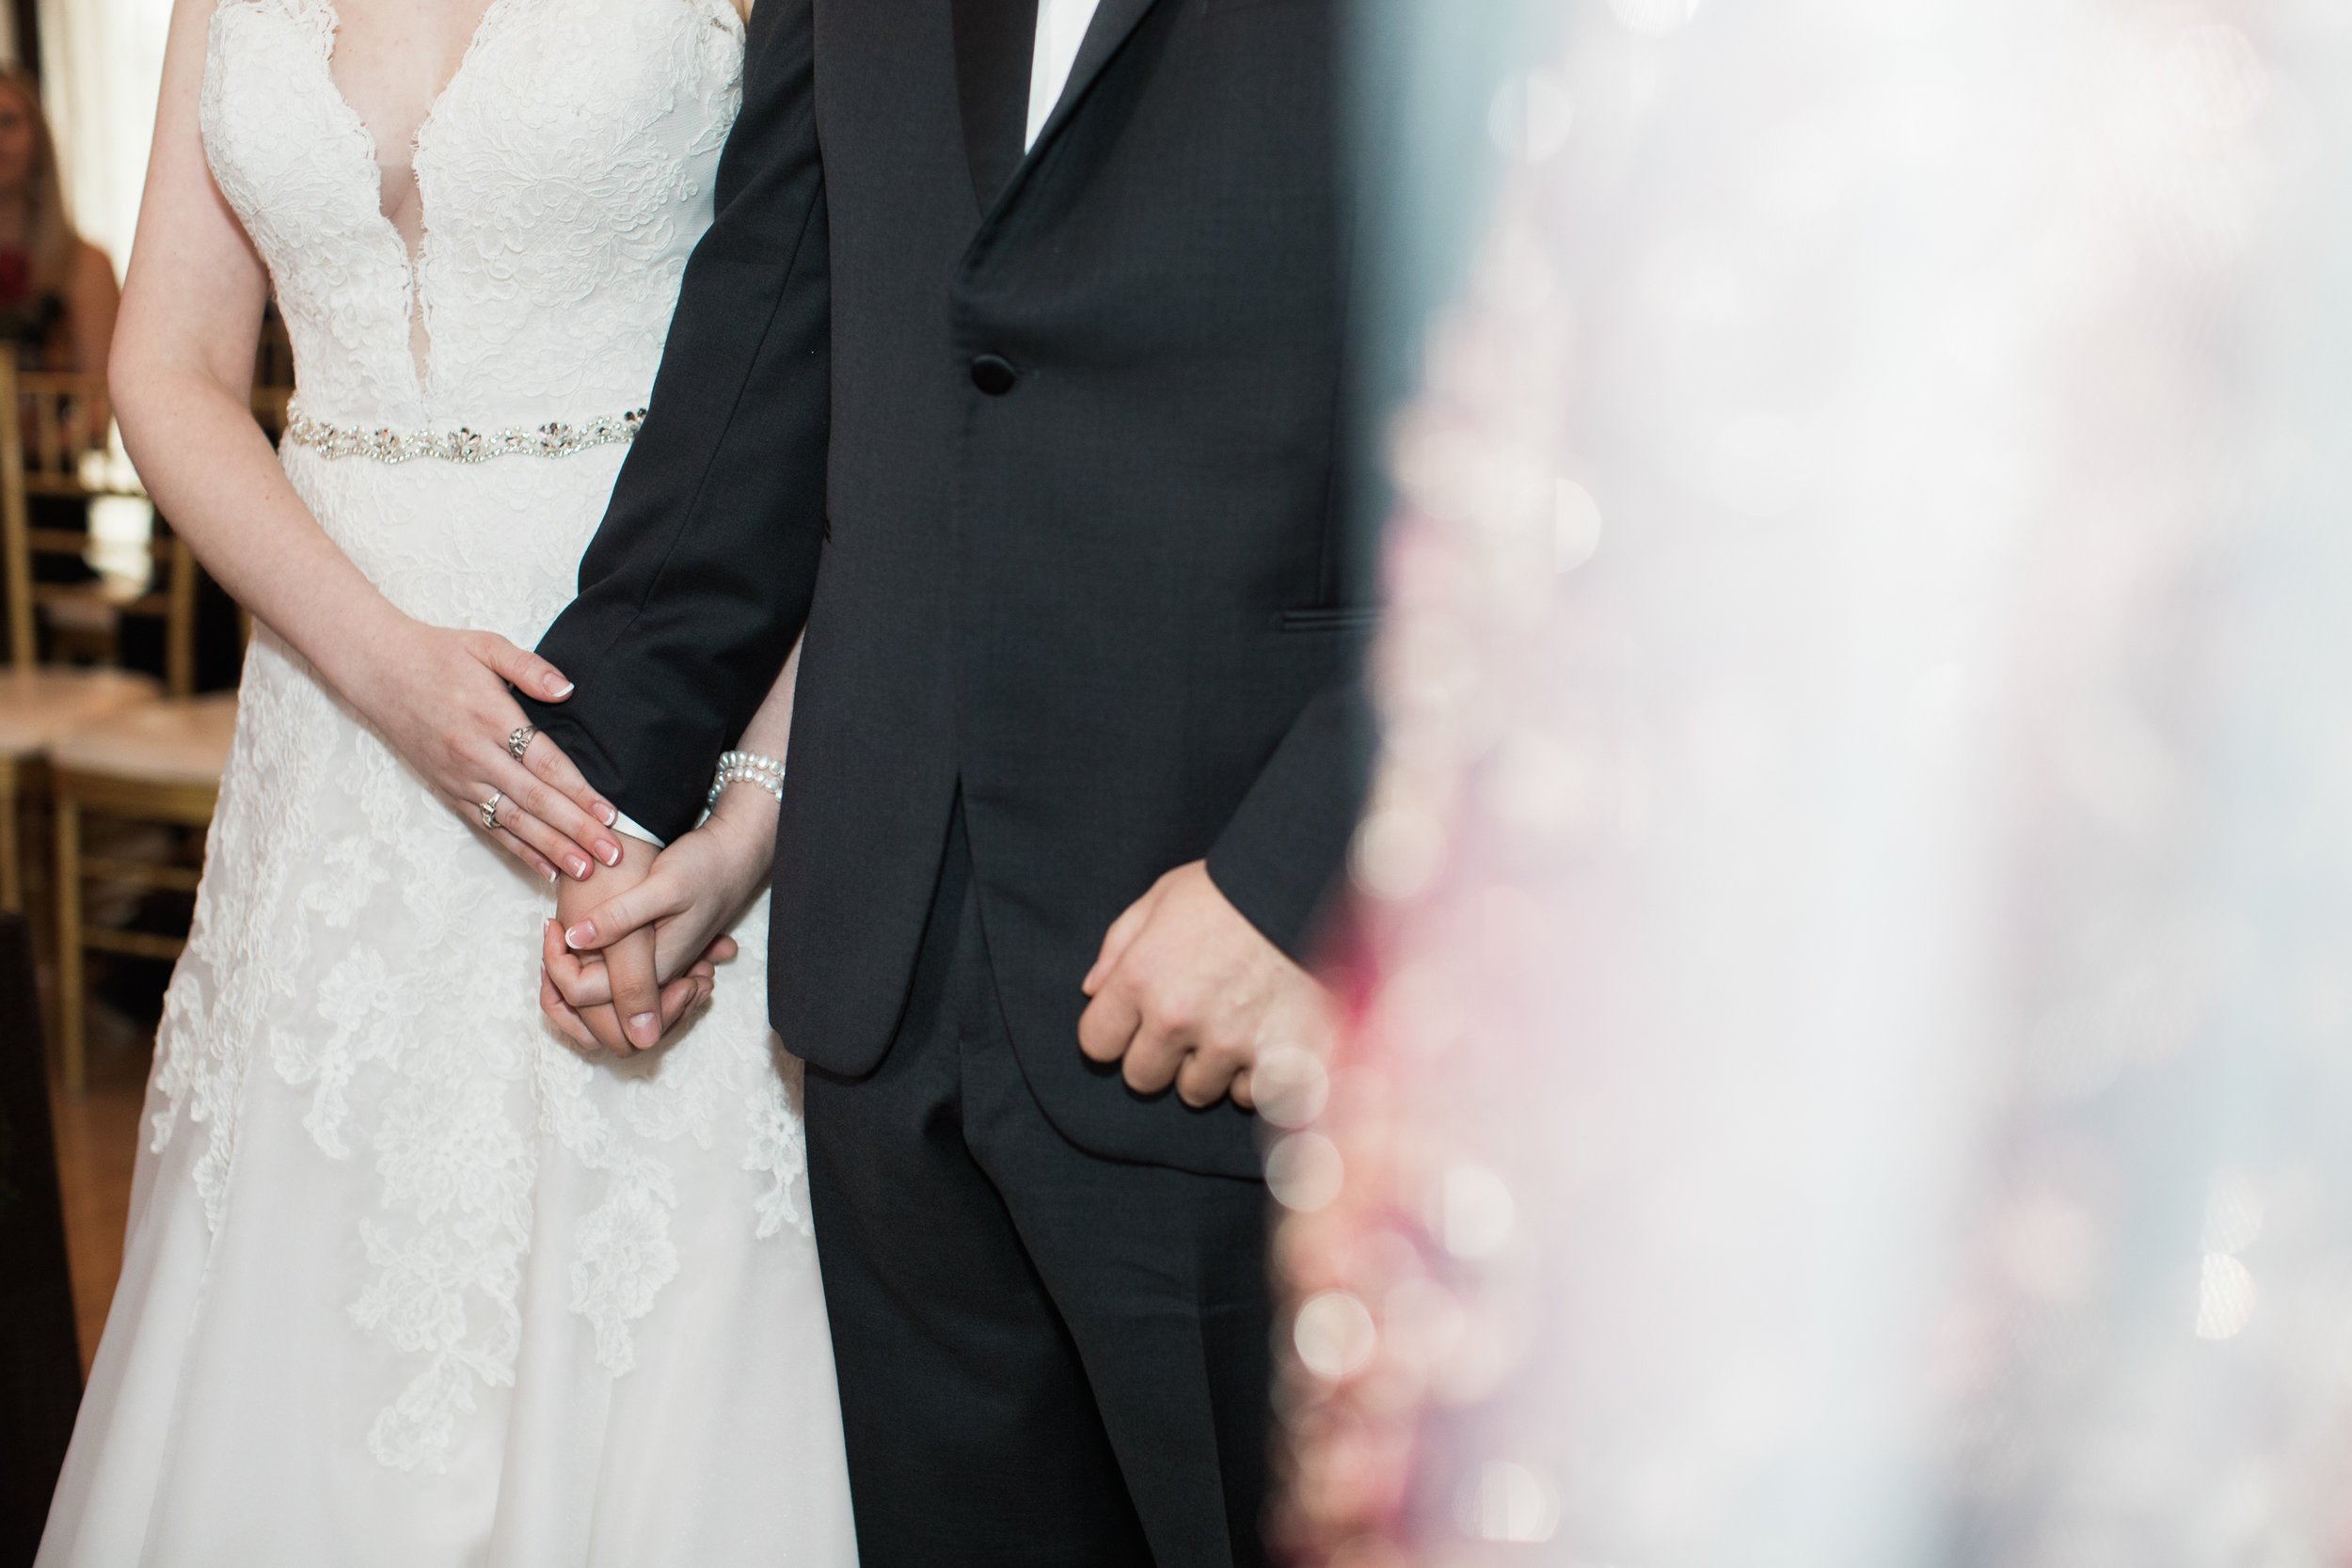 Harry Potter Wedding at Overhills Mansion Catonville Maryland Wedding Photographers Megapixels Media (75 of 134).jpg